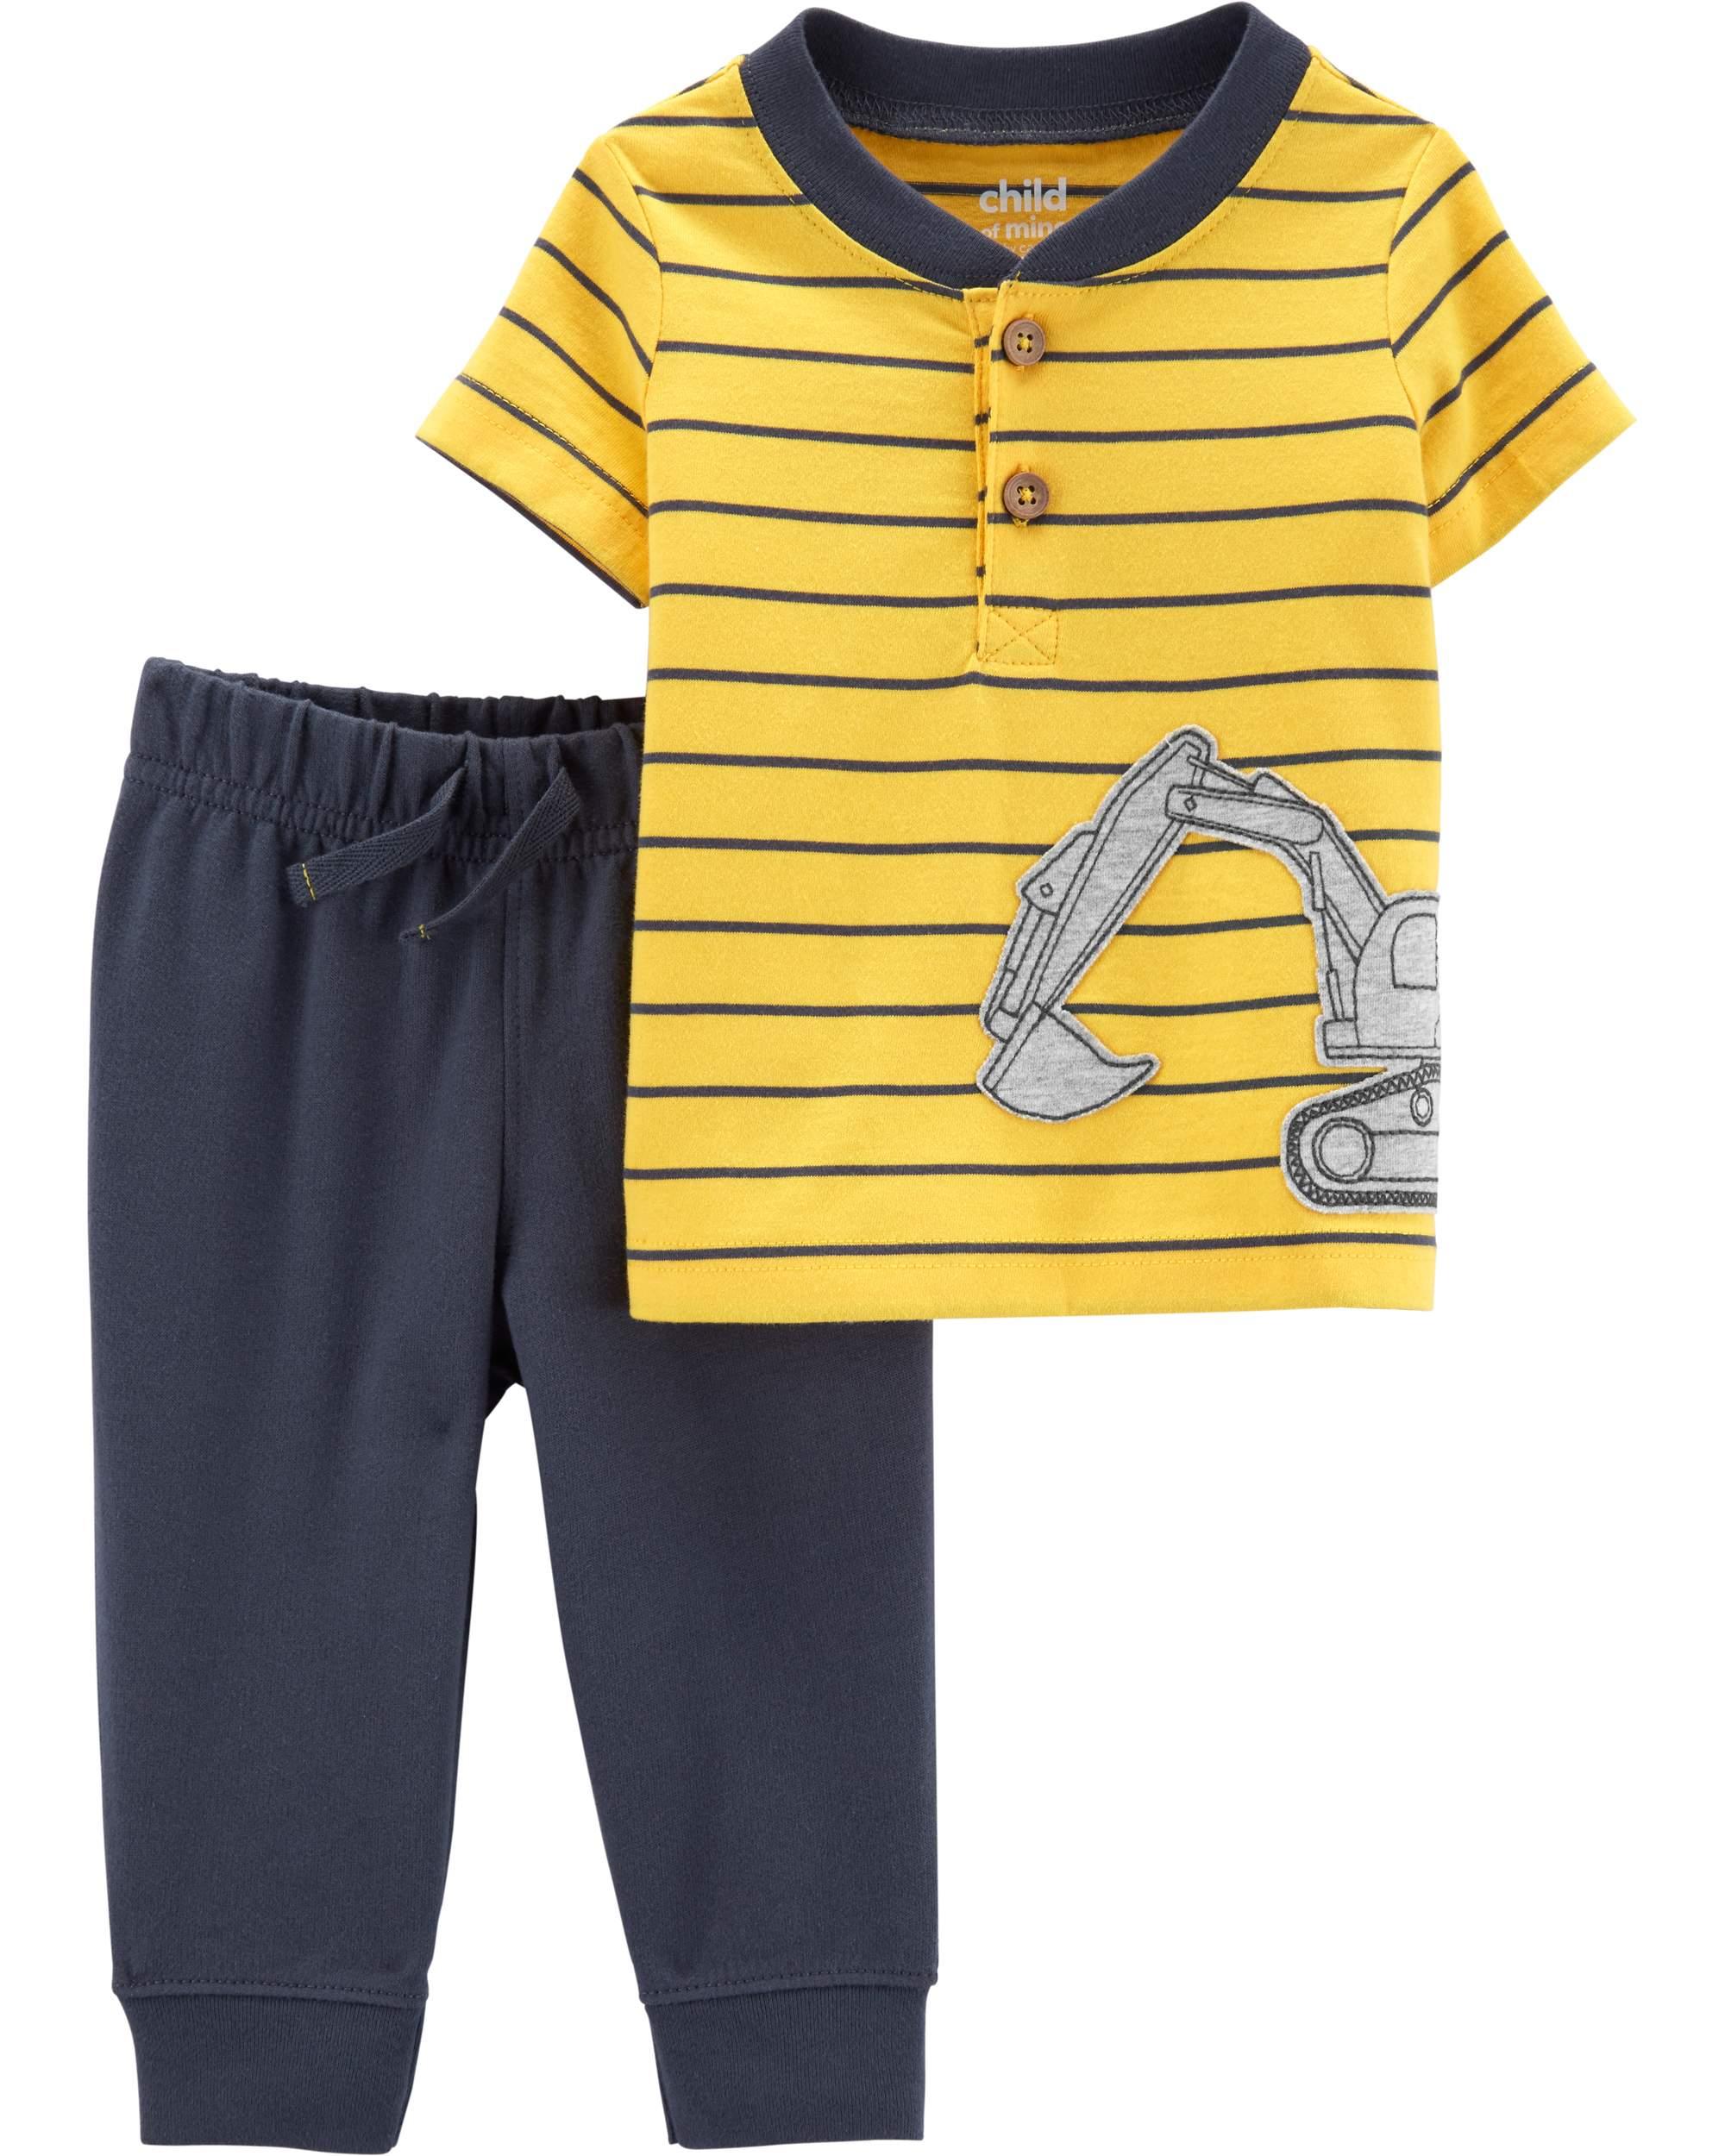 LITTLE REBELS 2T Toddler Boys 2Pc Short Set T-Shirt Alligator Mouth Opens